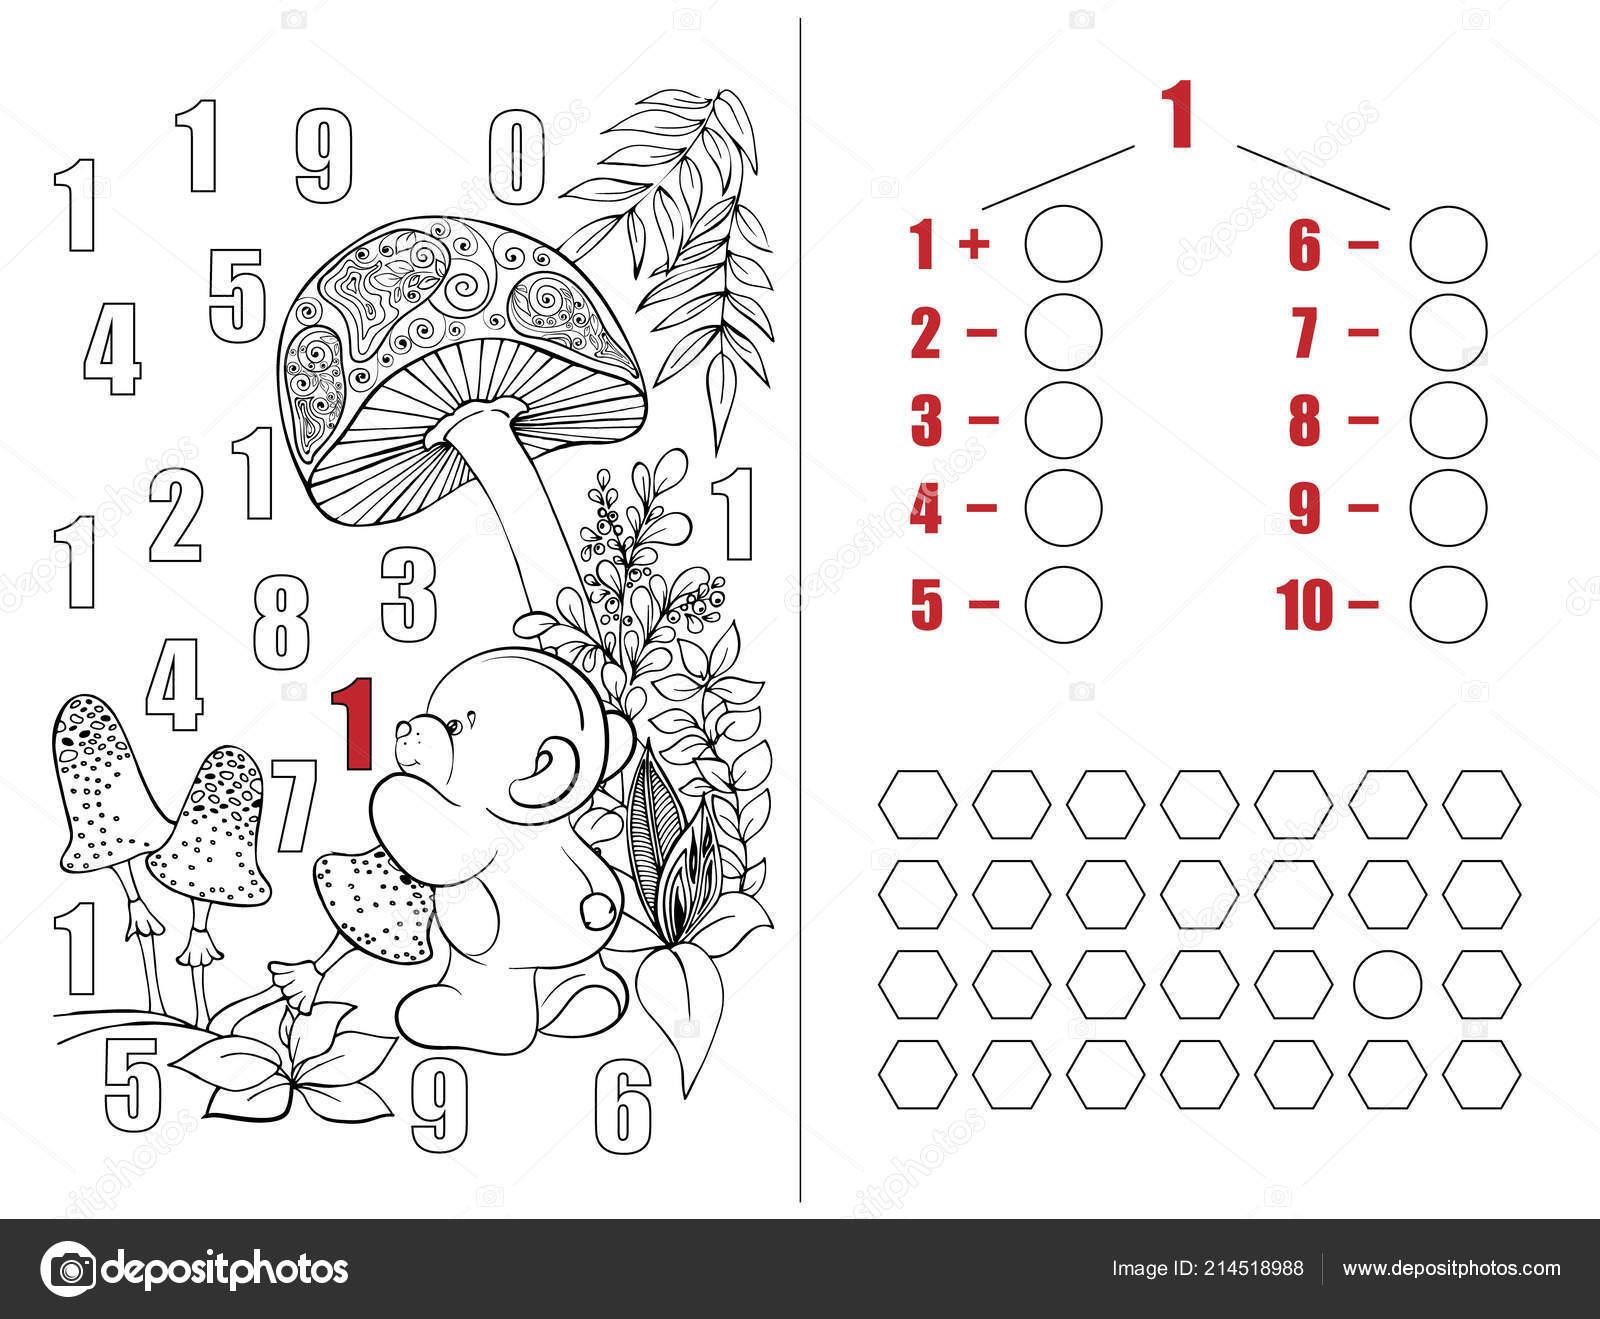 Rompecabezas Para Niños Matemáticas Oso Peluche Glade Números Tarea